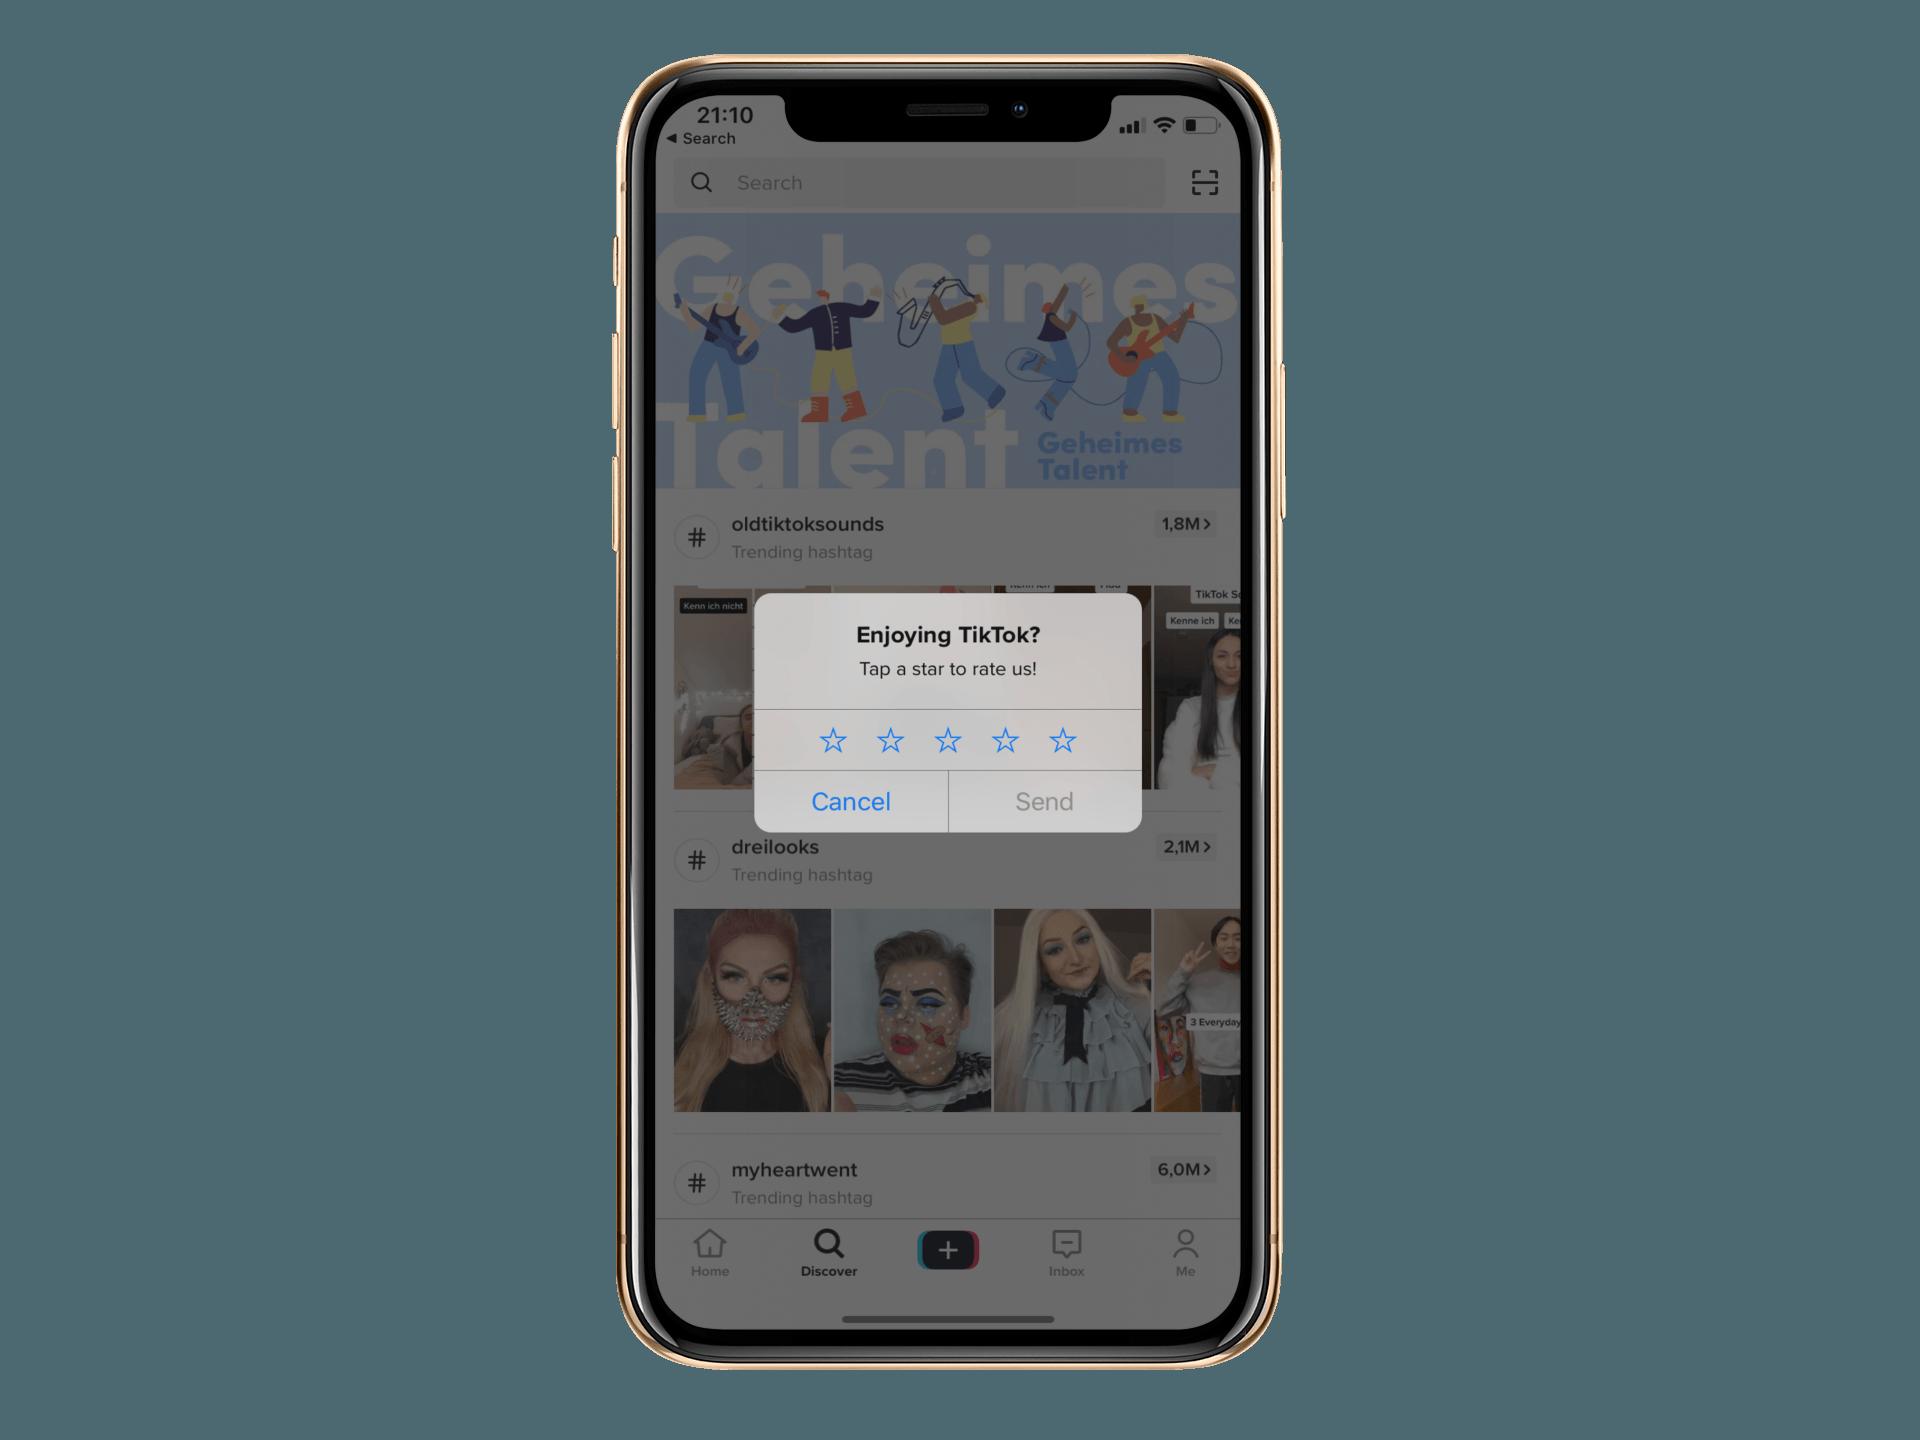 App Bewertung Fragen